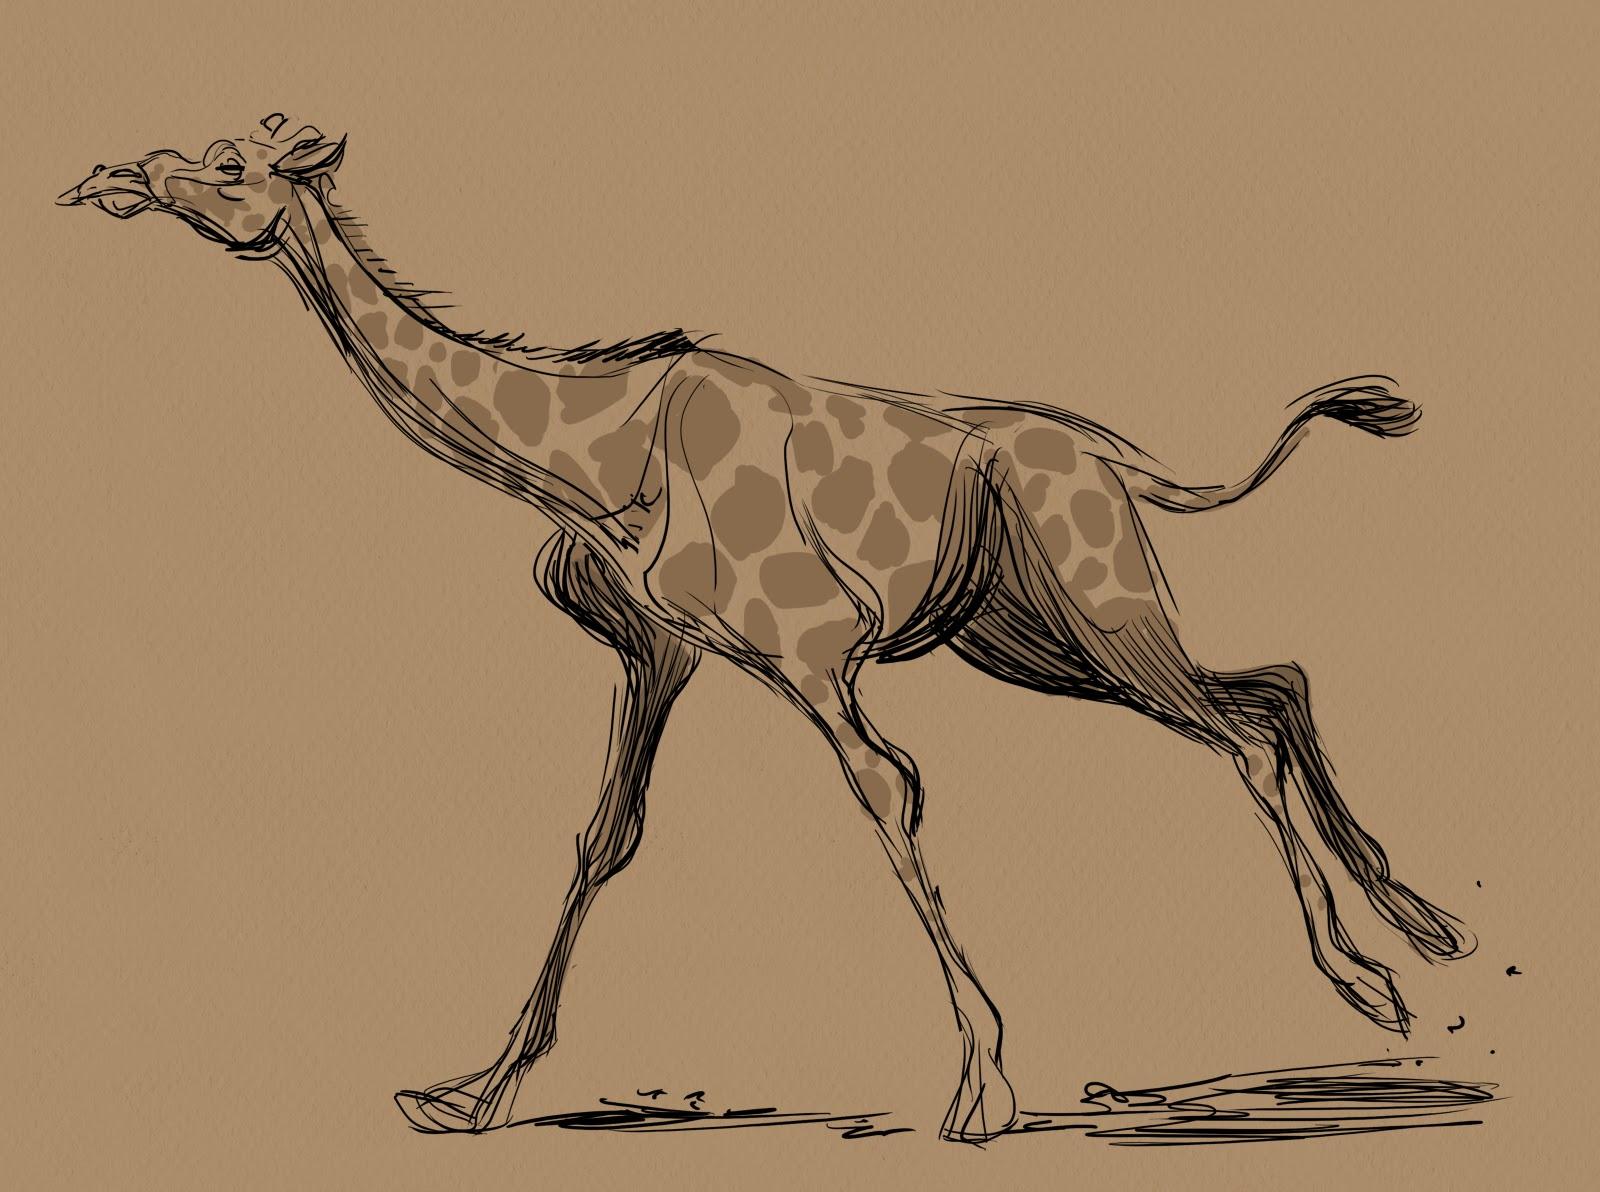 Animal and Life Drawing Blog: Some Giraffe sketches. Cool Giraffe Drawing